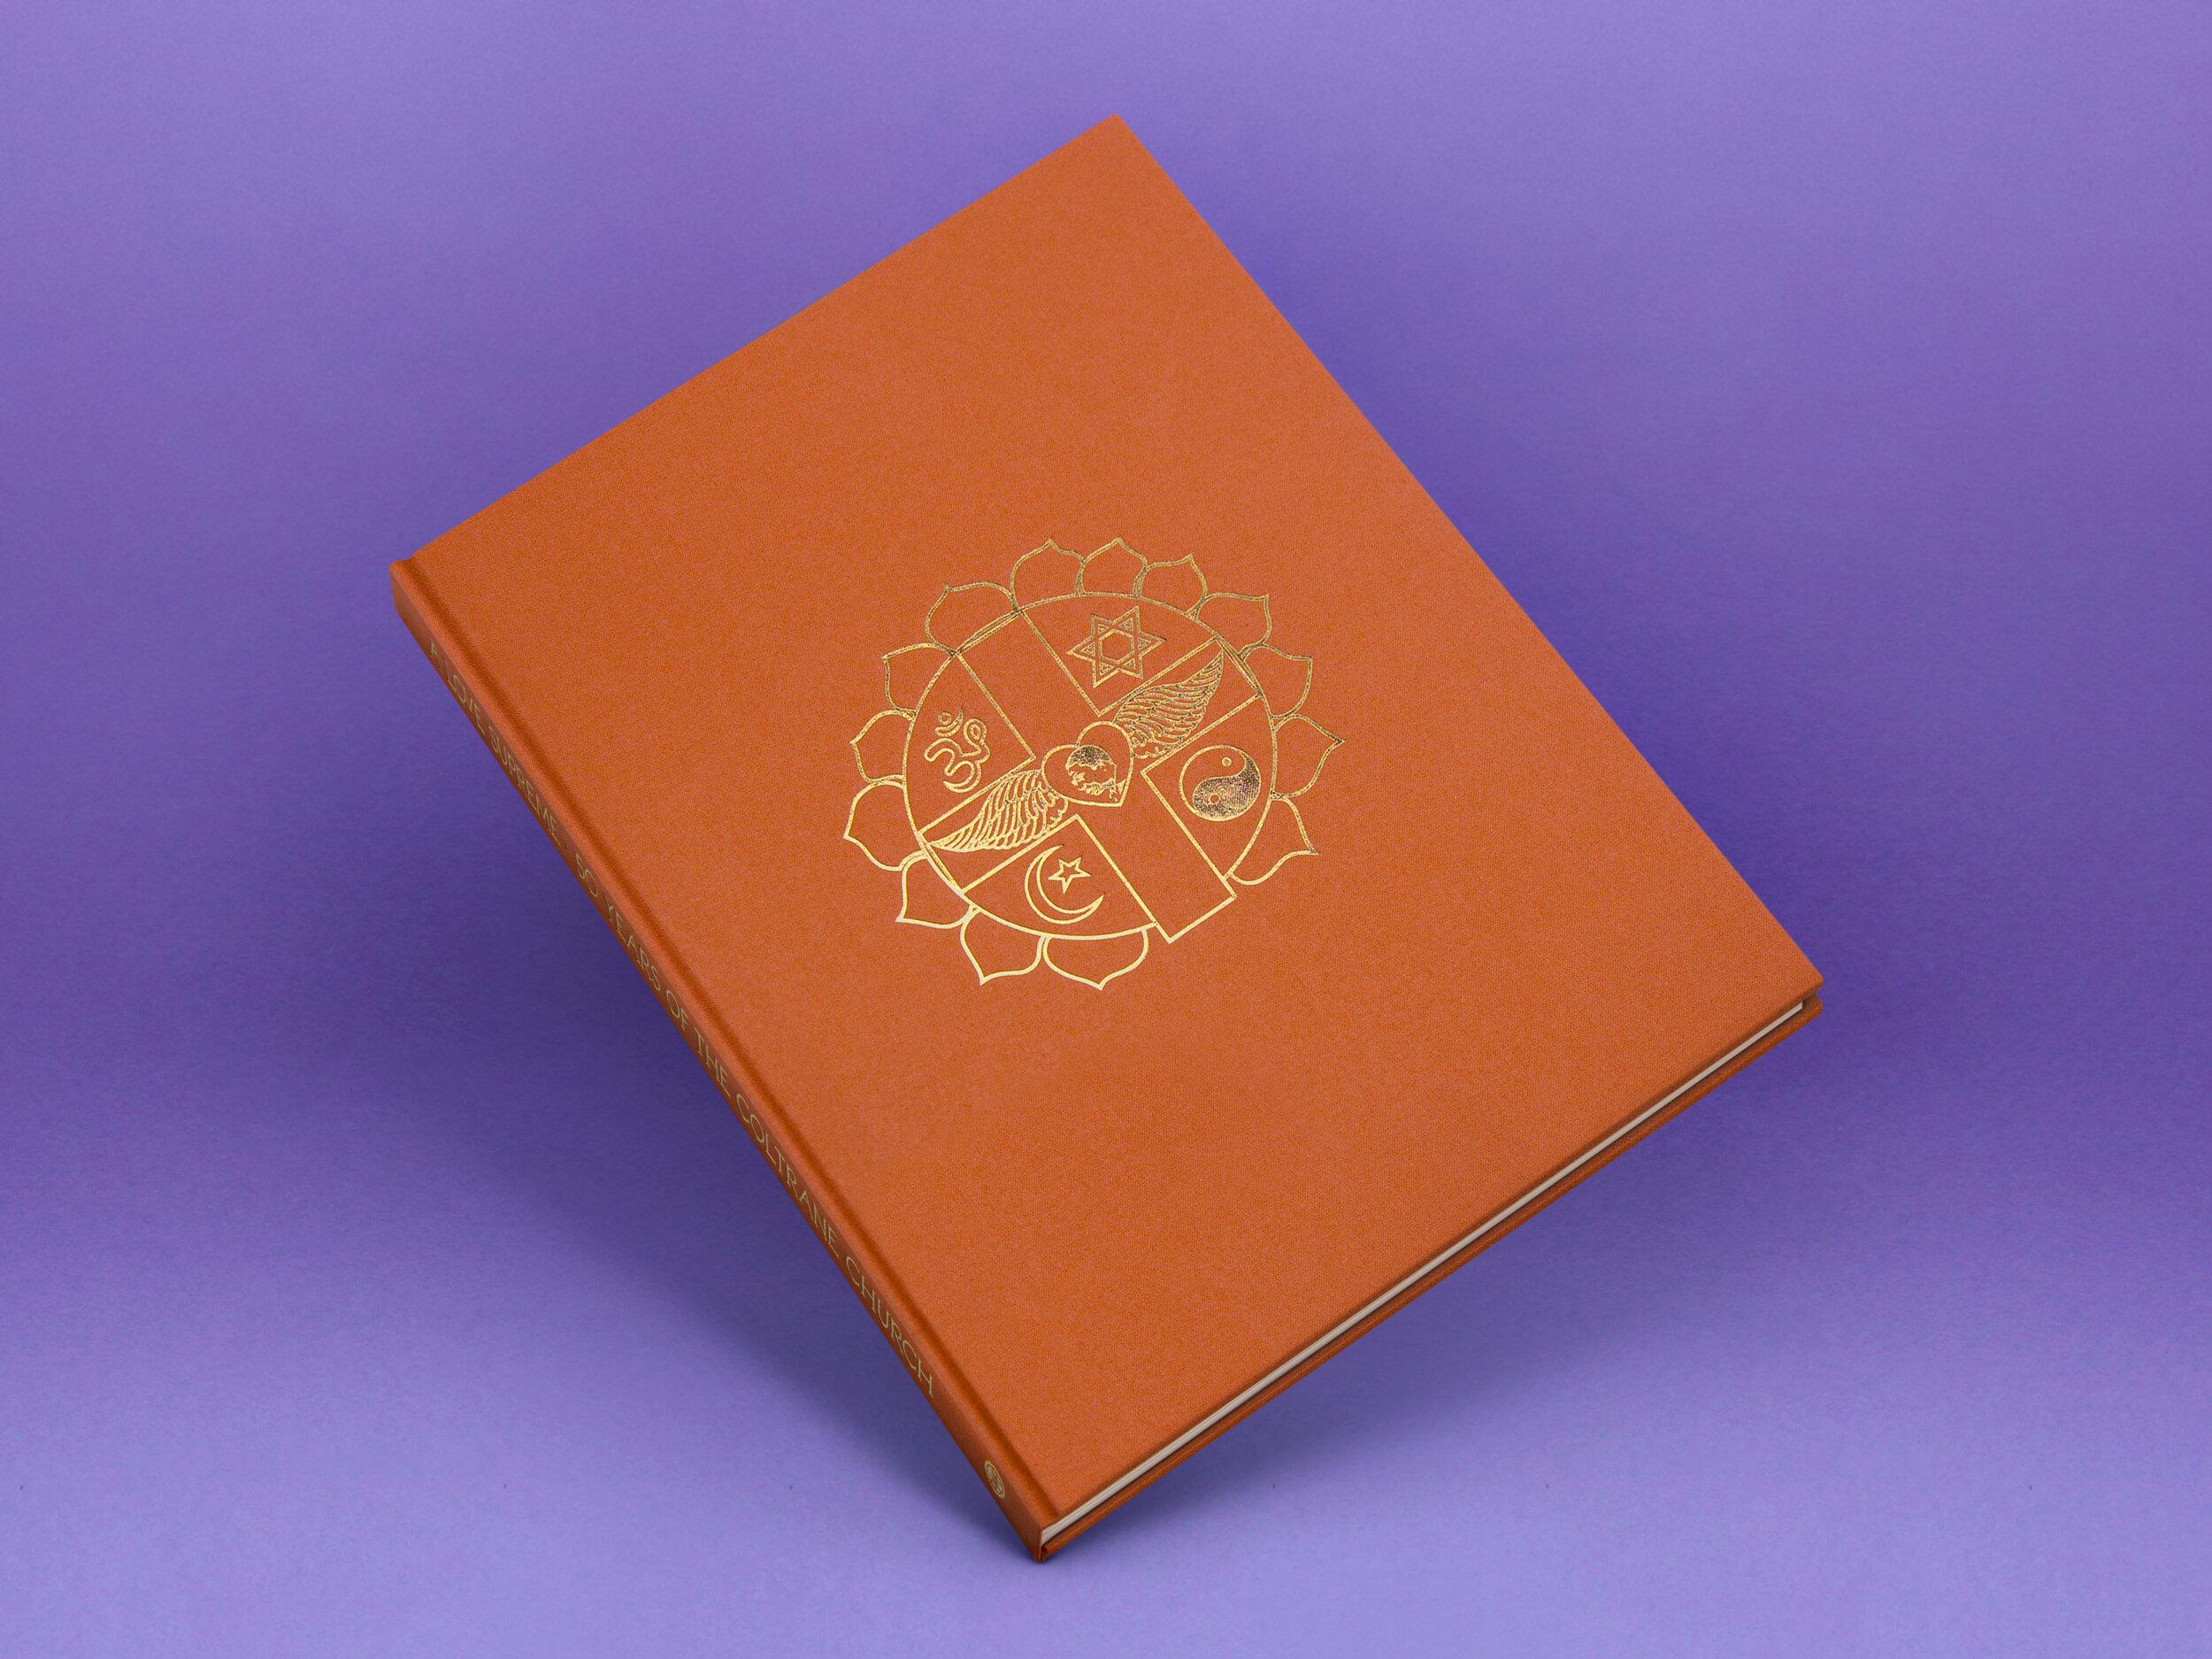 ColtraneBook_COVER.jpg